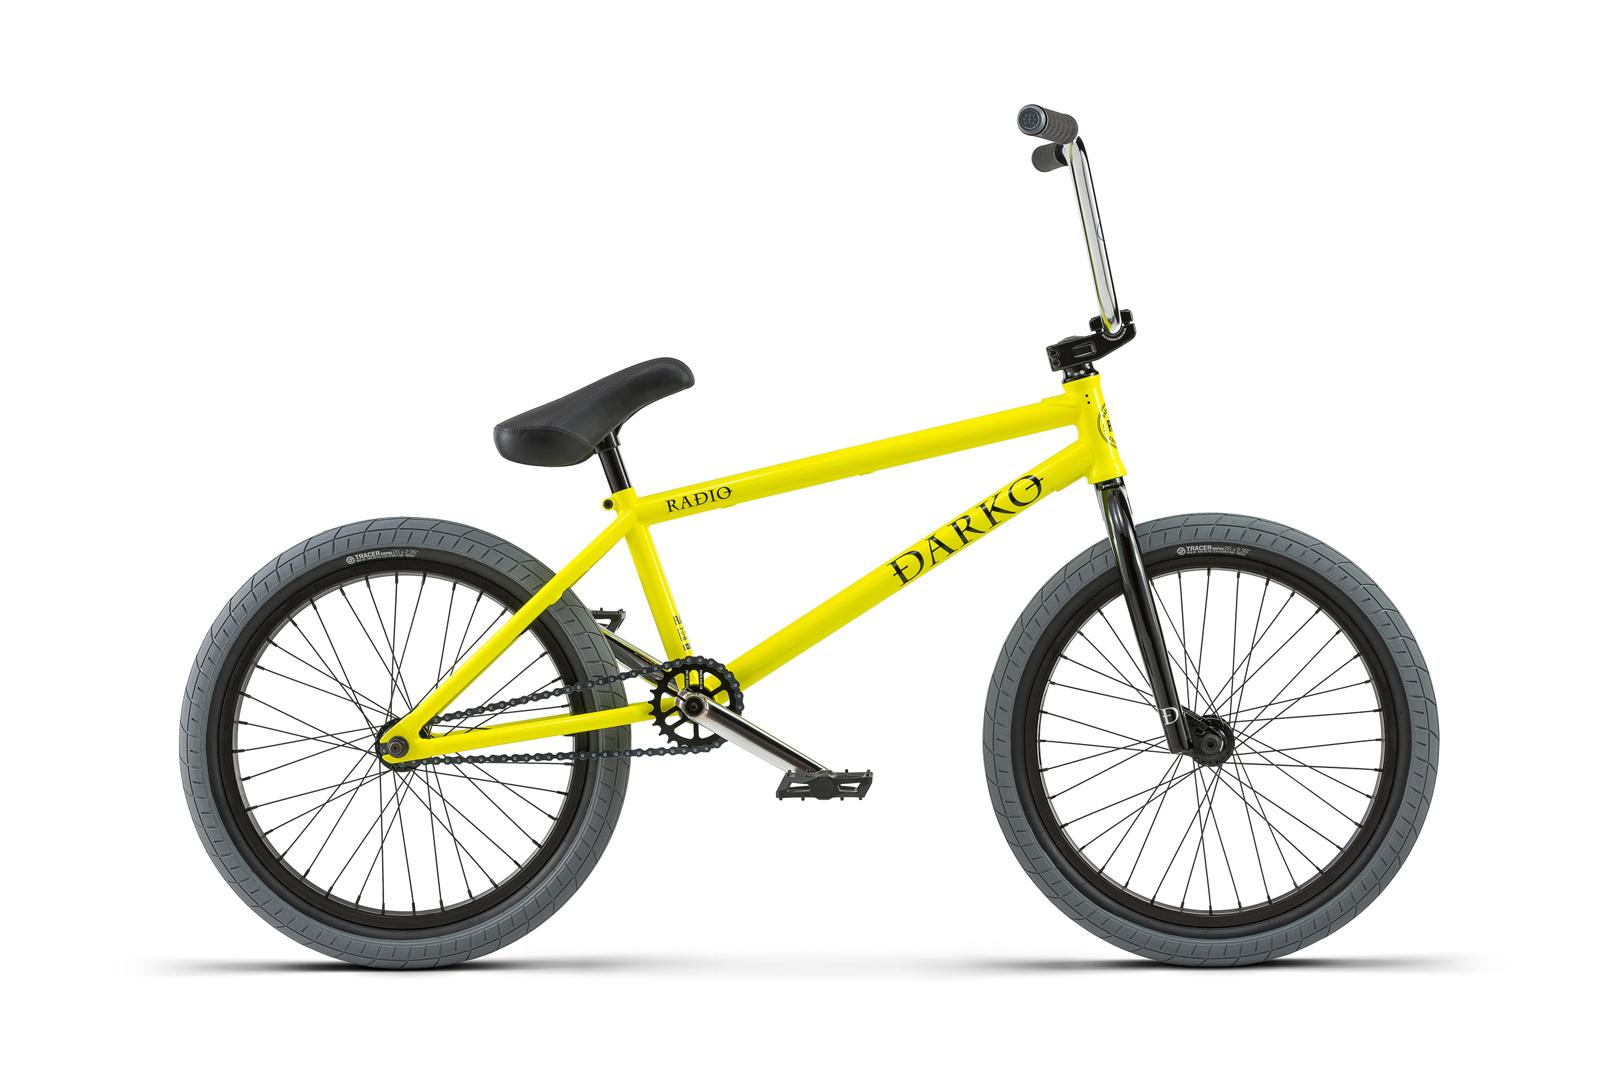 The New Darko Bmx From Radio Bikes